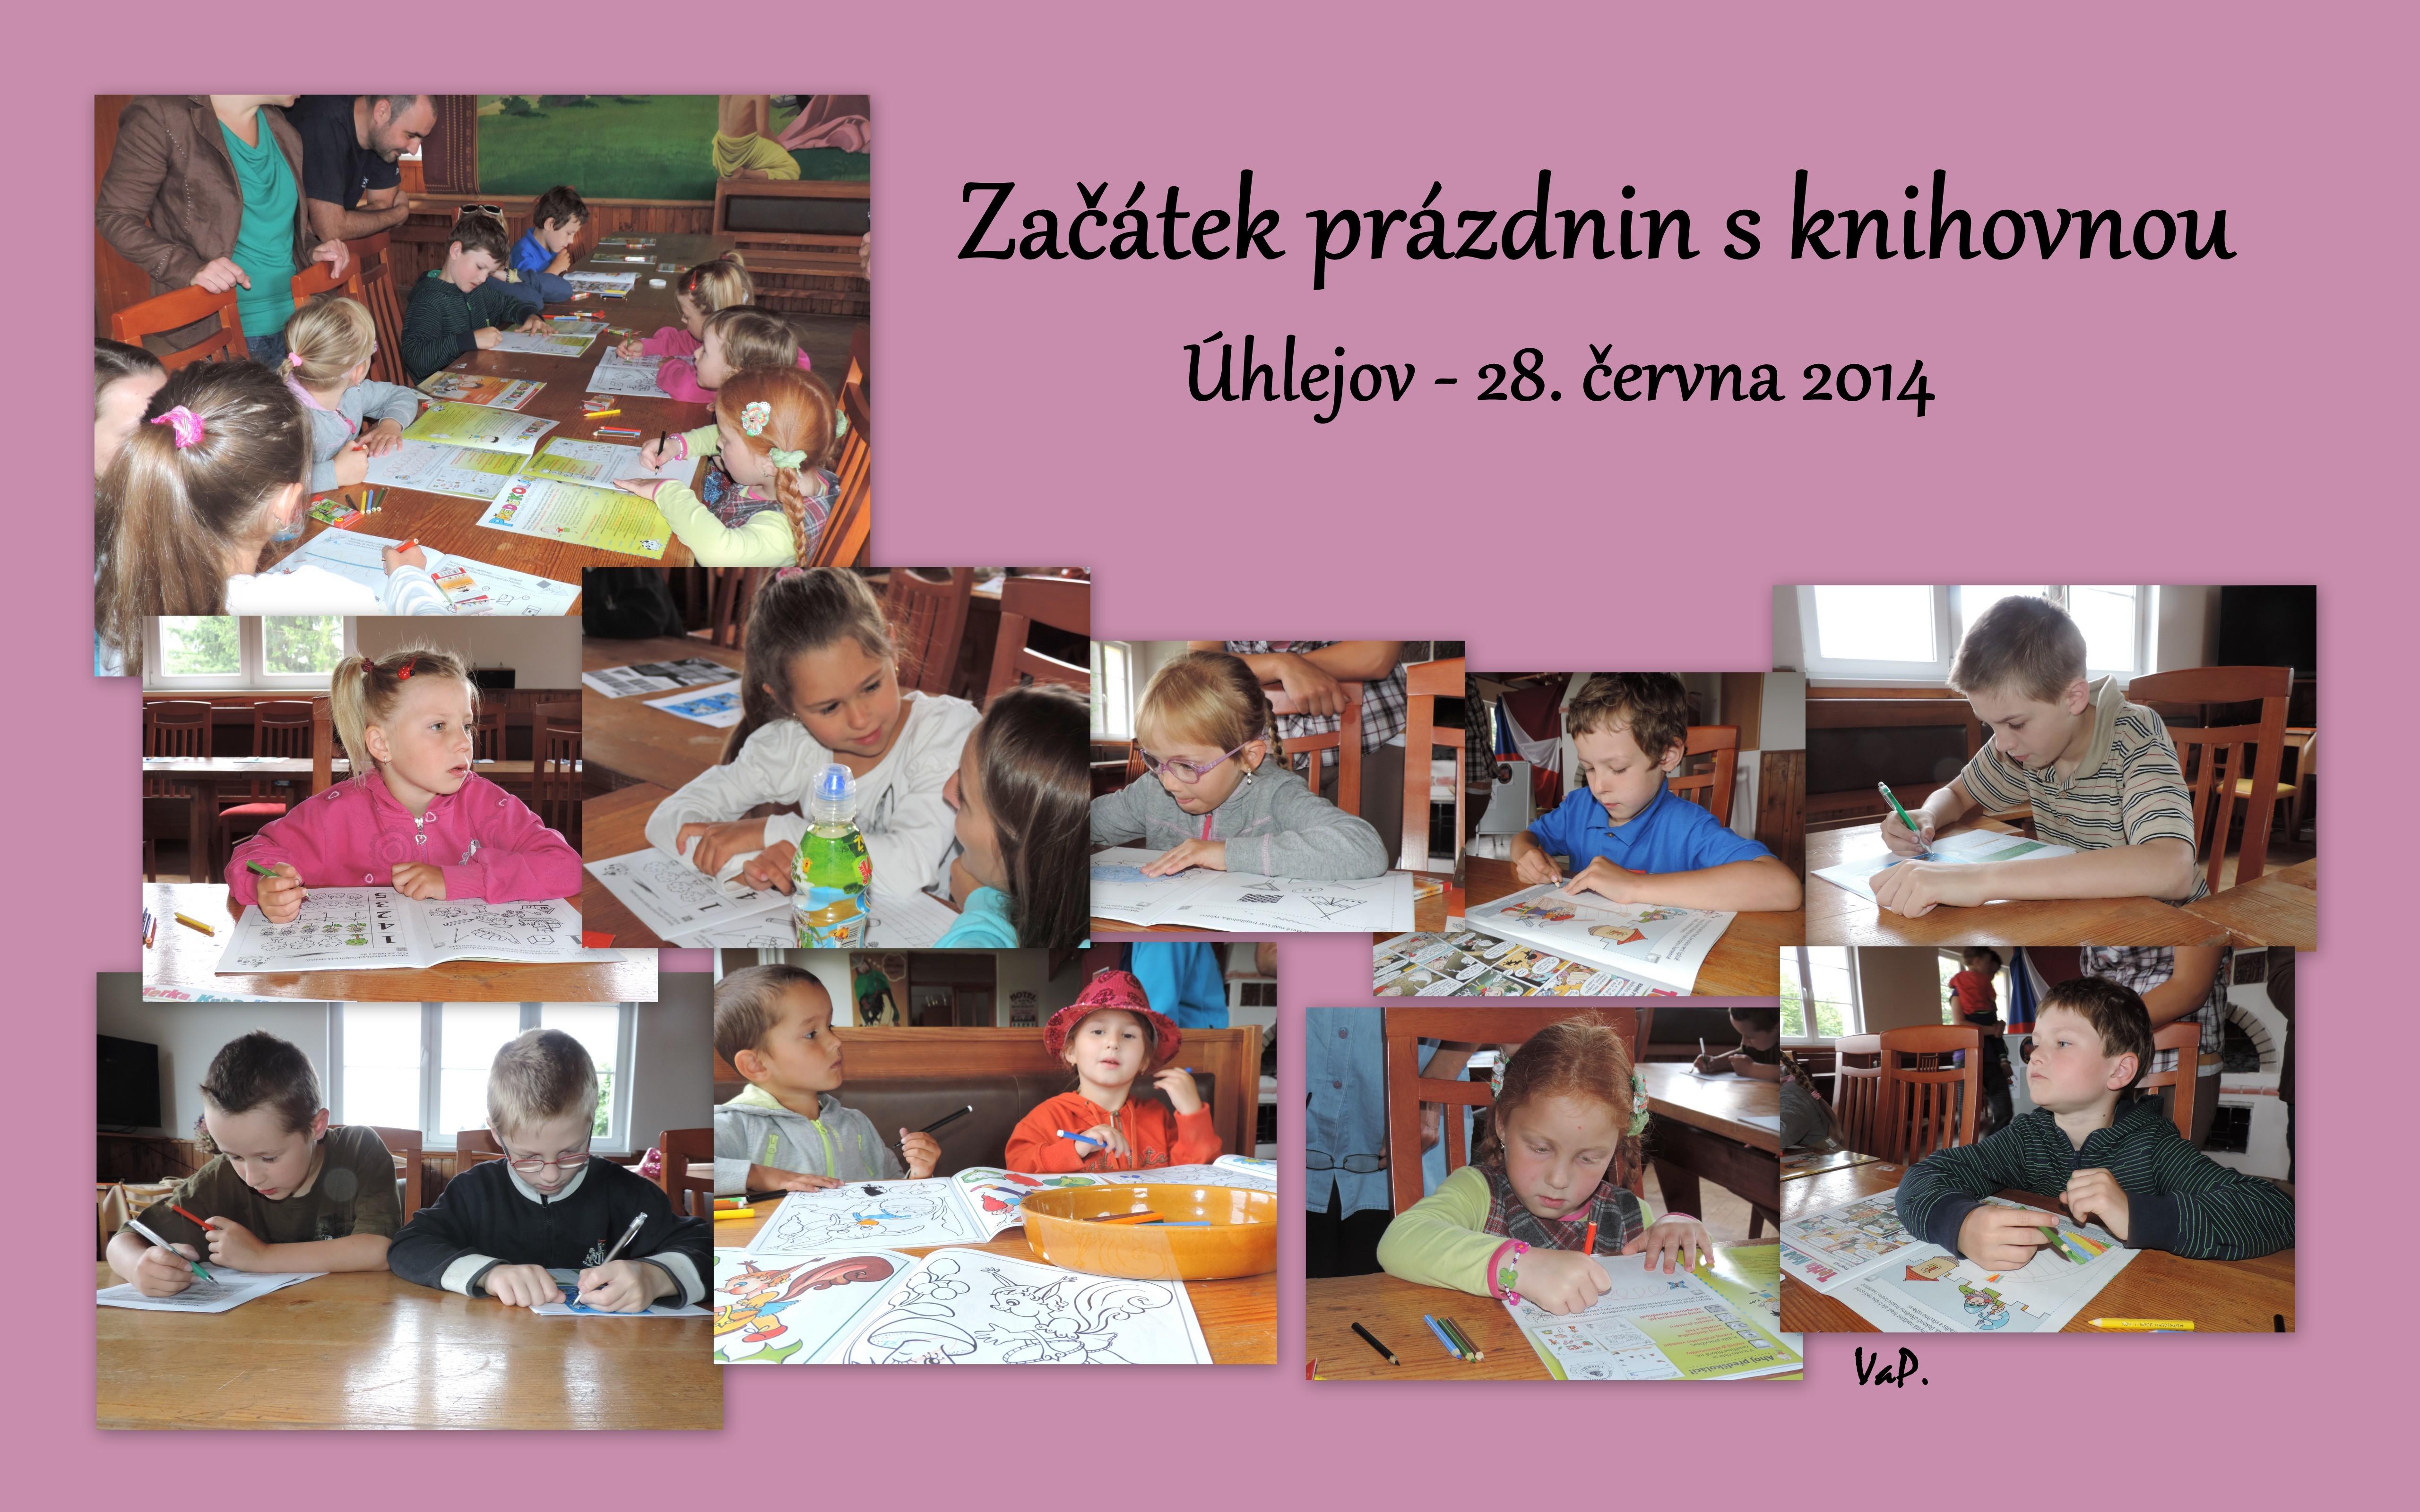 OBRÁZEK : zacatek_prazdnin_s_knihovnou_kolaz_1.jpg